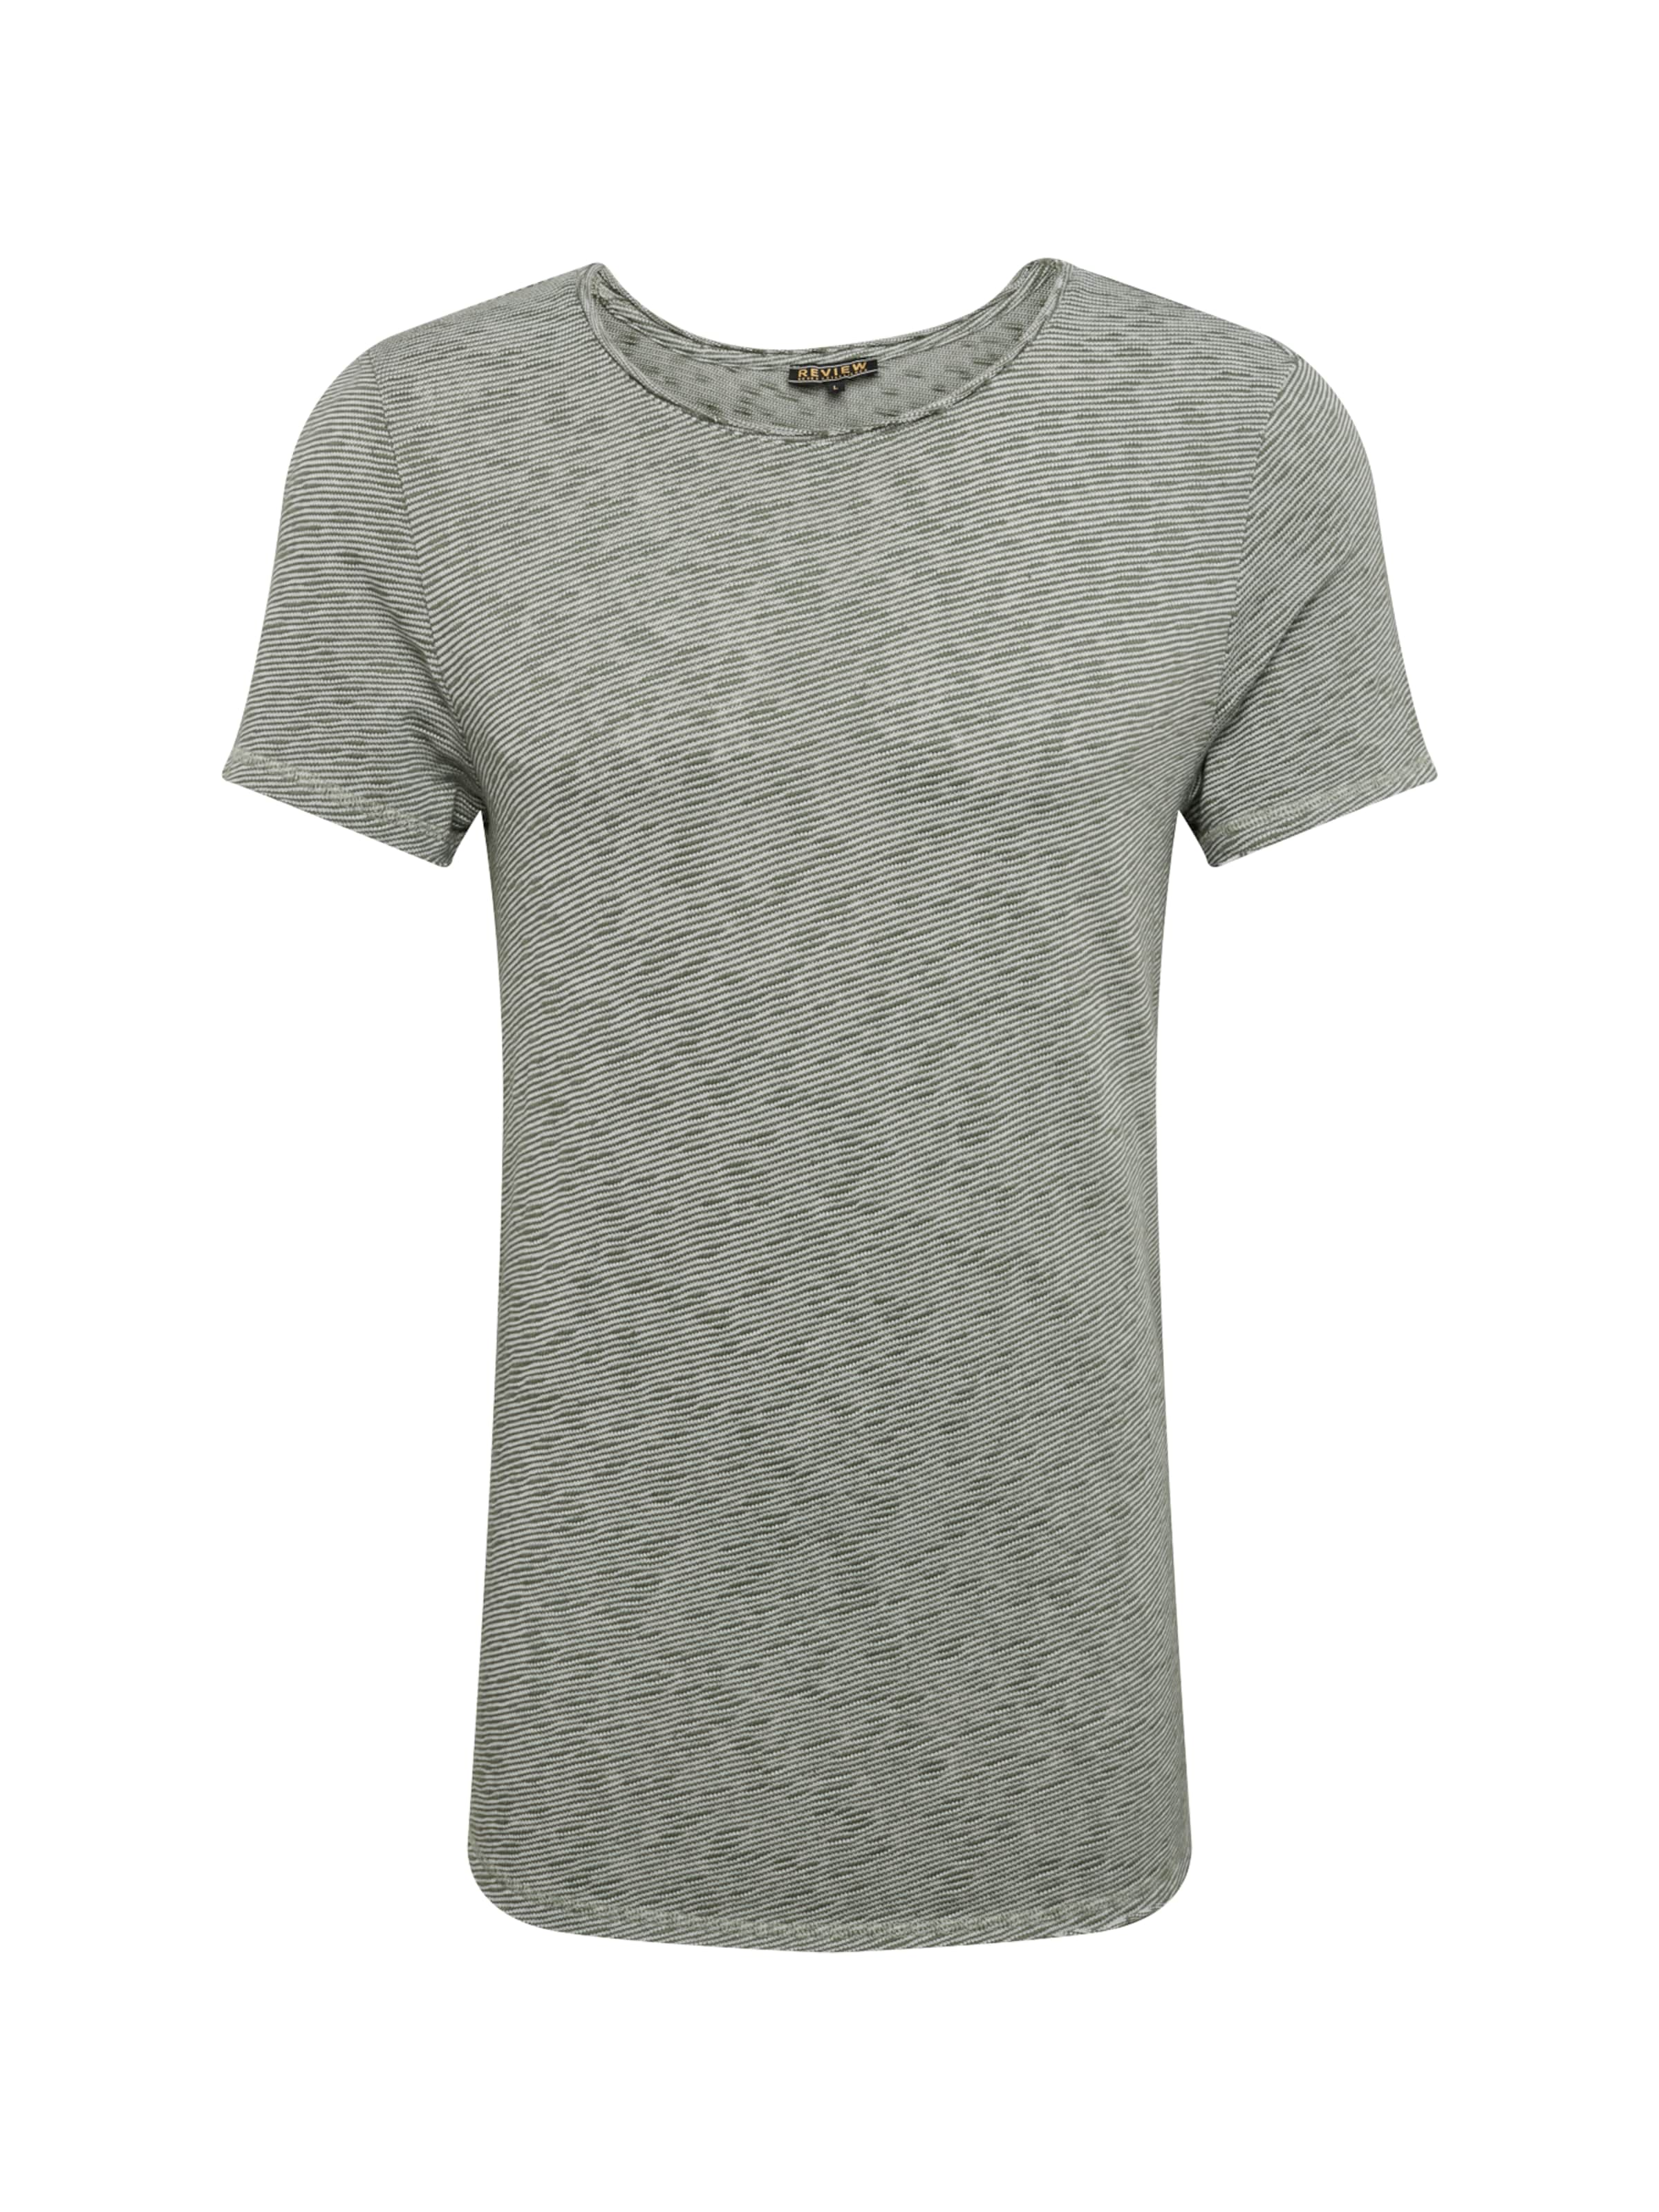 shirt In Dunkelgrün T 'yarndyedslubstri' Review ZOkXilPuTw